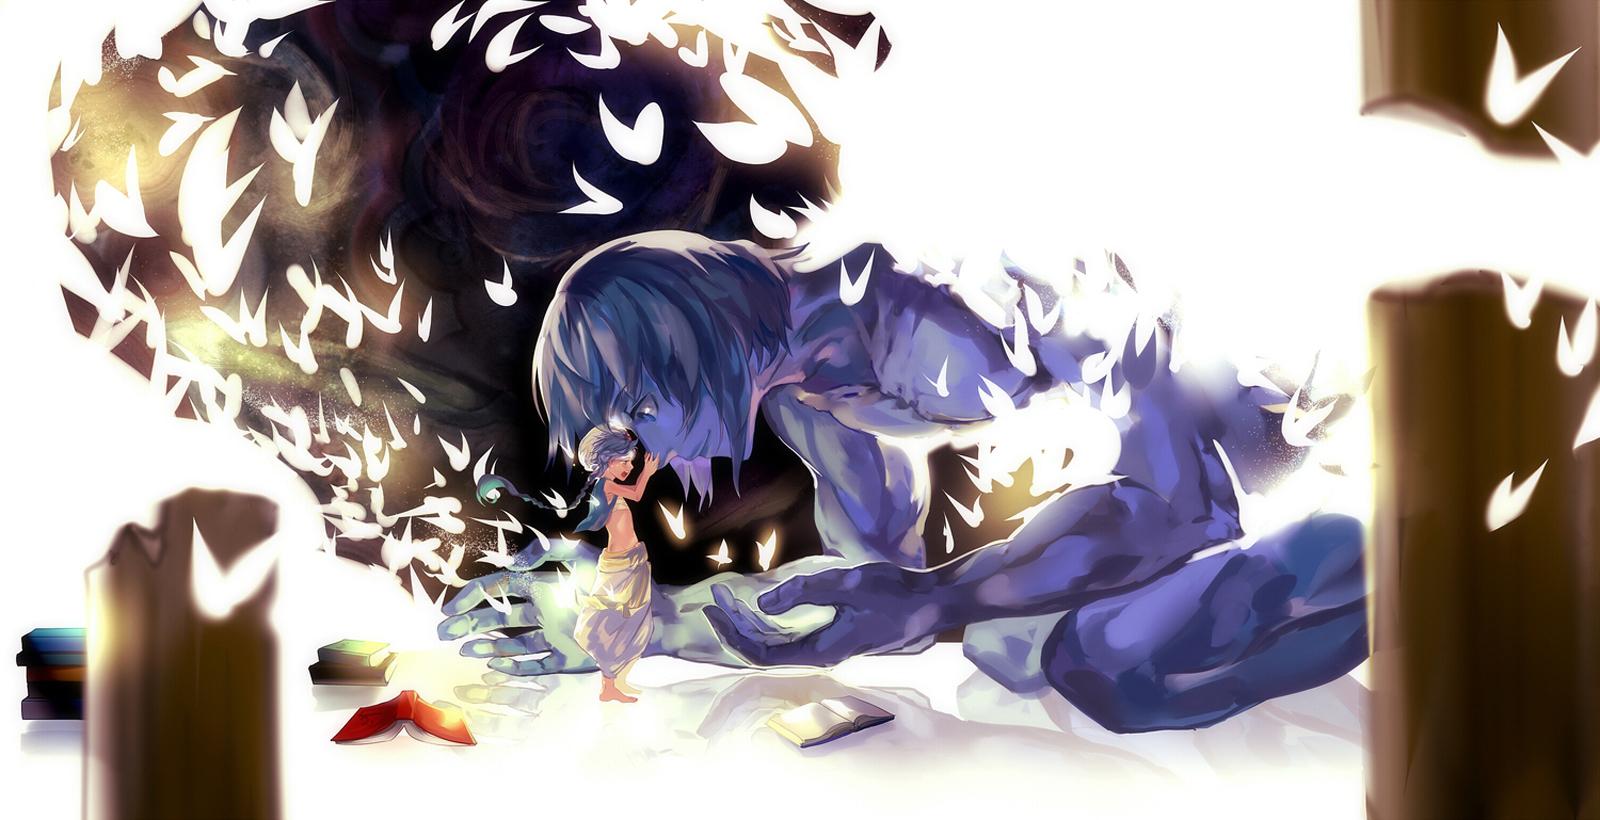 Aladdin Ugo Magi  the labyrinth of magic anime konochan hd wallpaper for  desktop